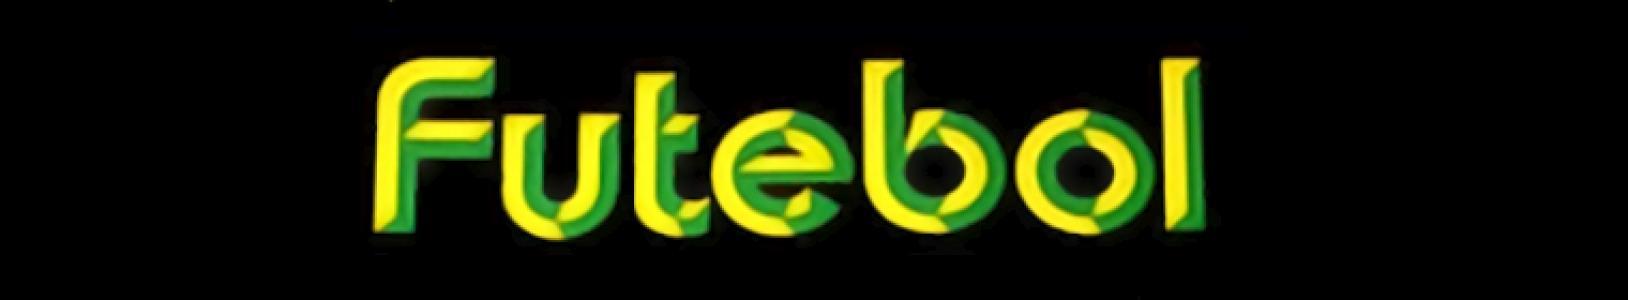 banner(s)